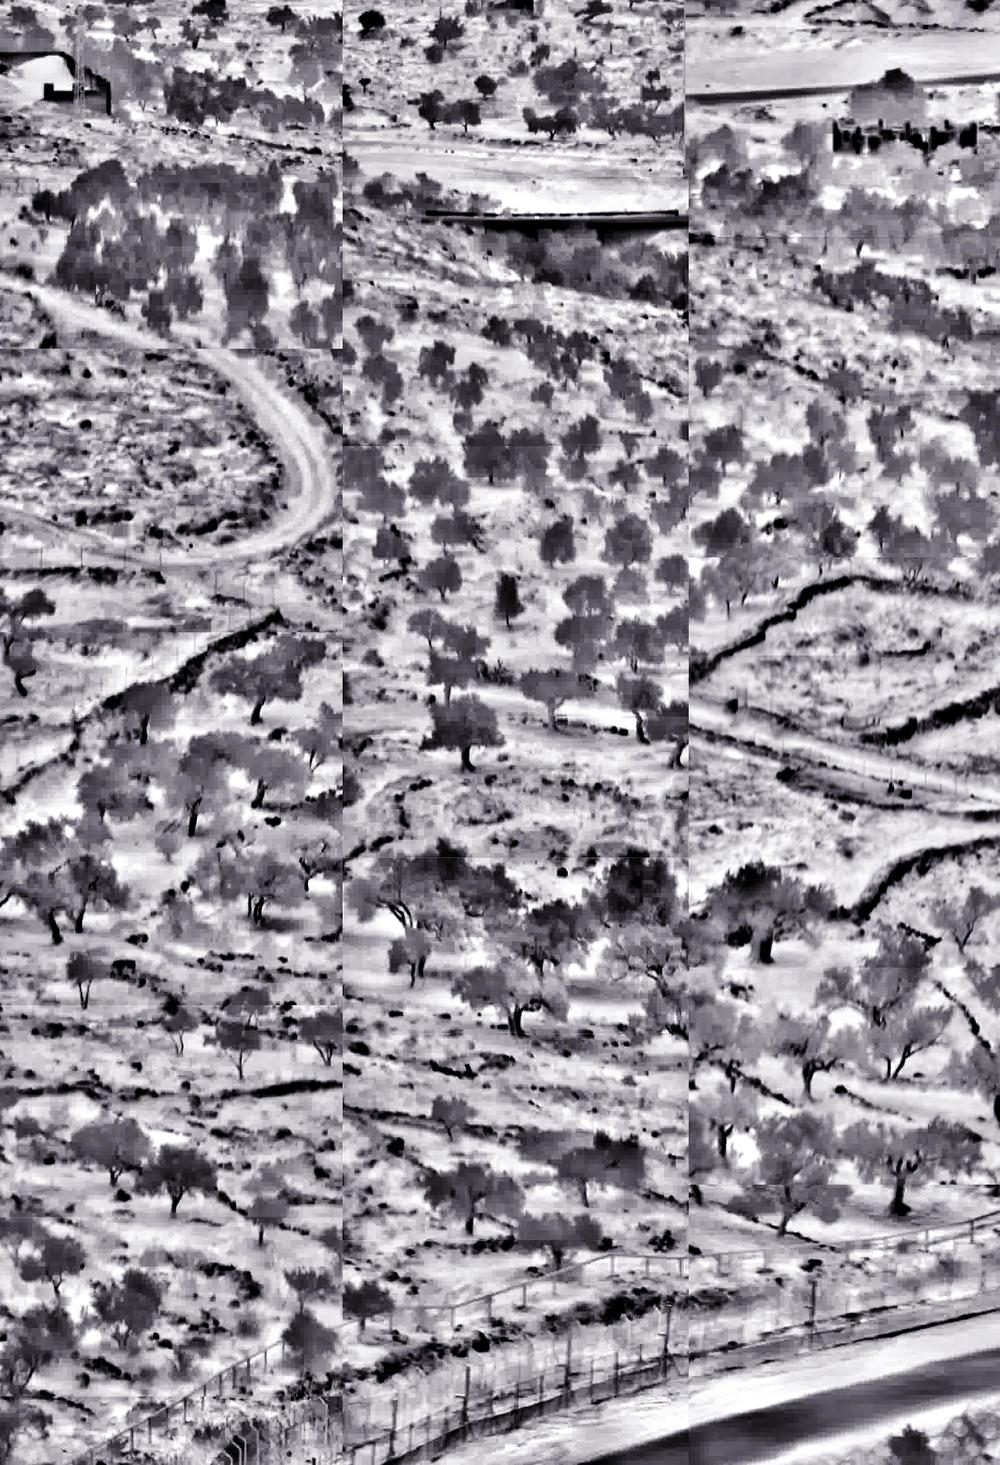 West Bank,الضفة الغربية,הגדה המערבית